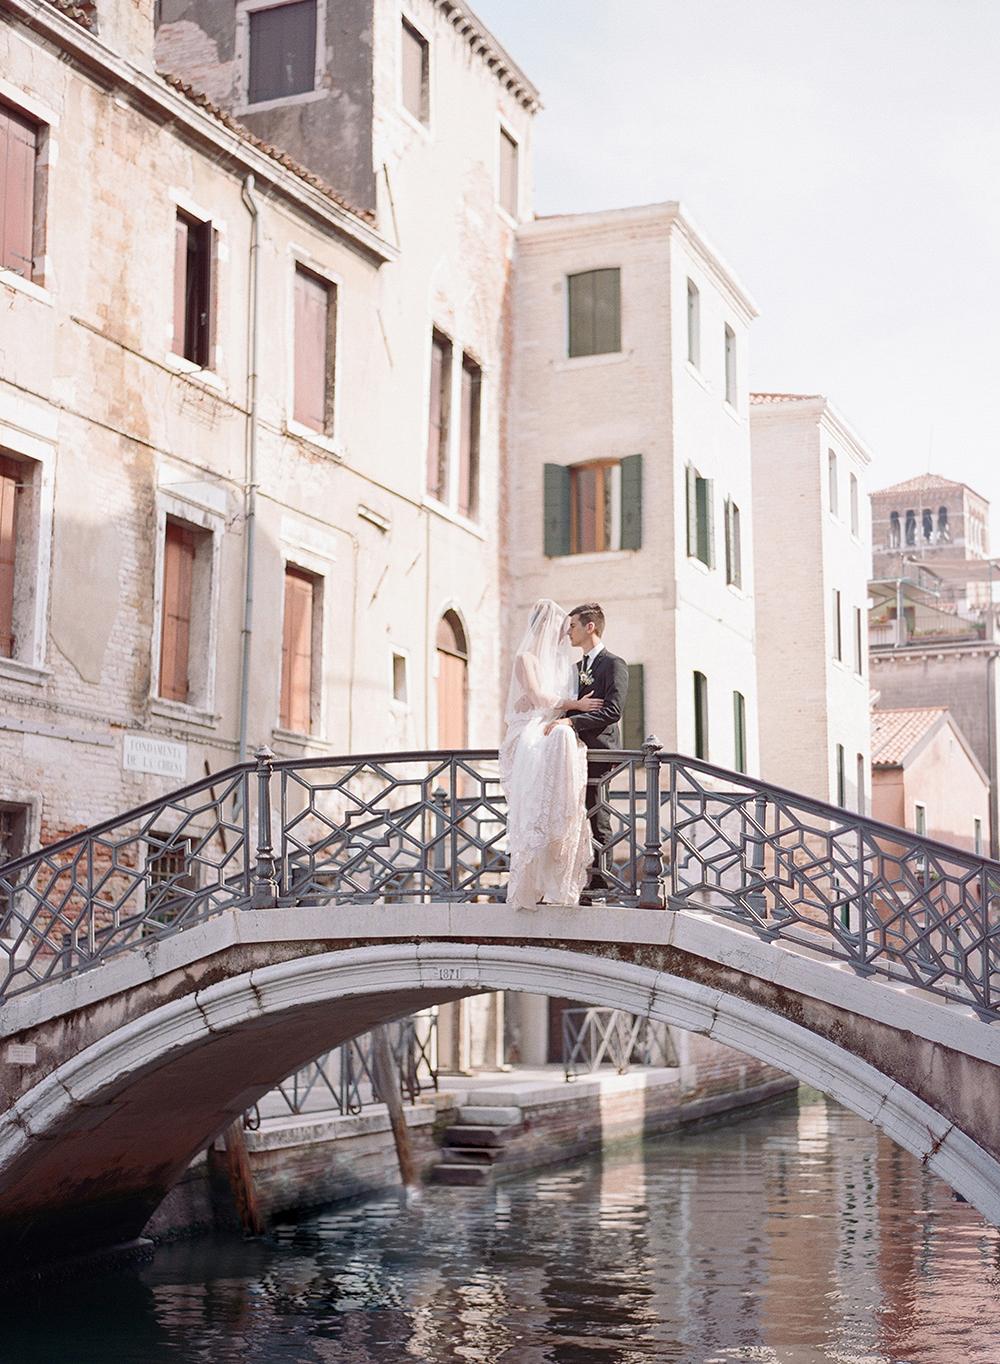 078_Venice.jpg